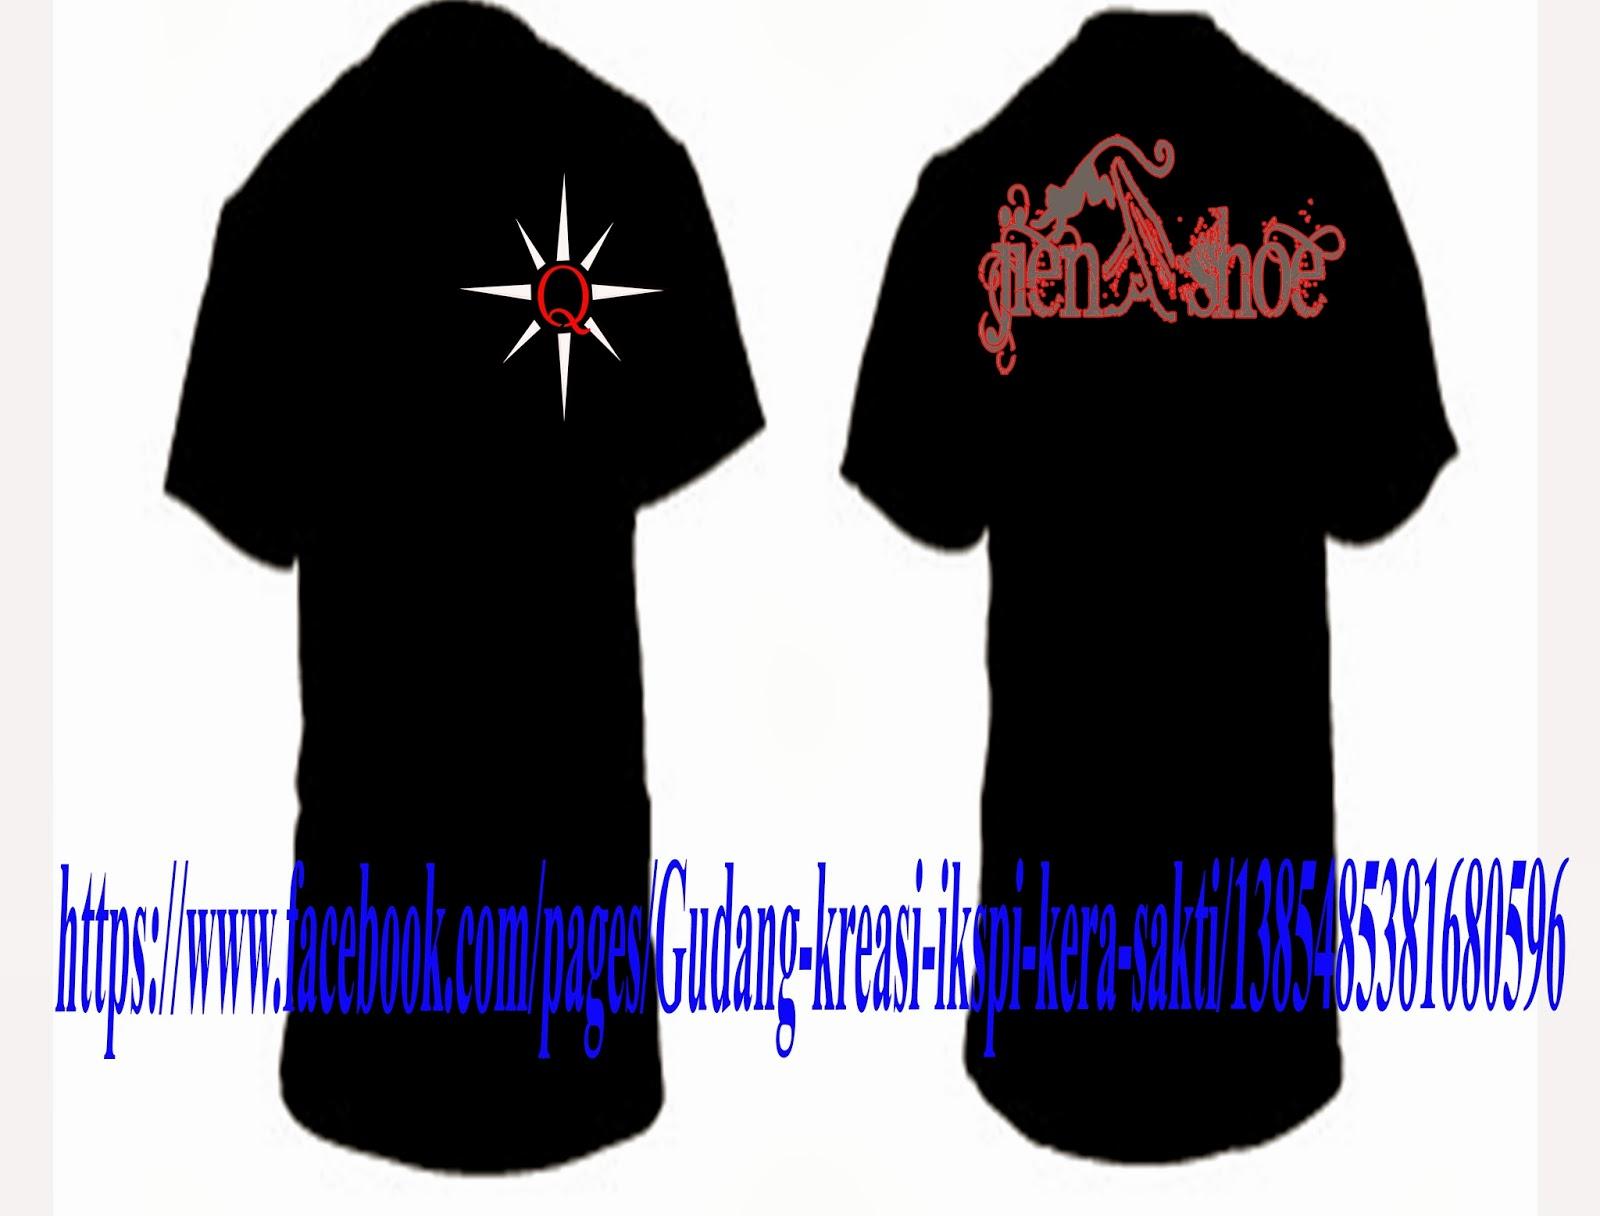 5300 Ide Desain Kaos Ikspi Terbaik Download Gratis